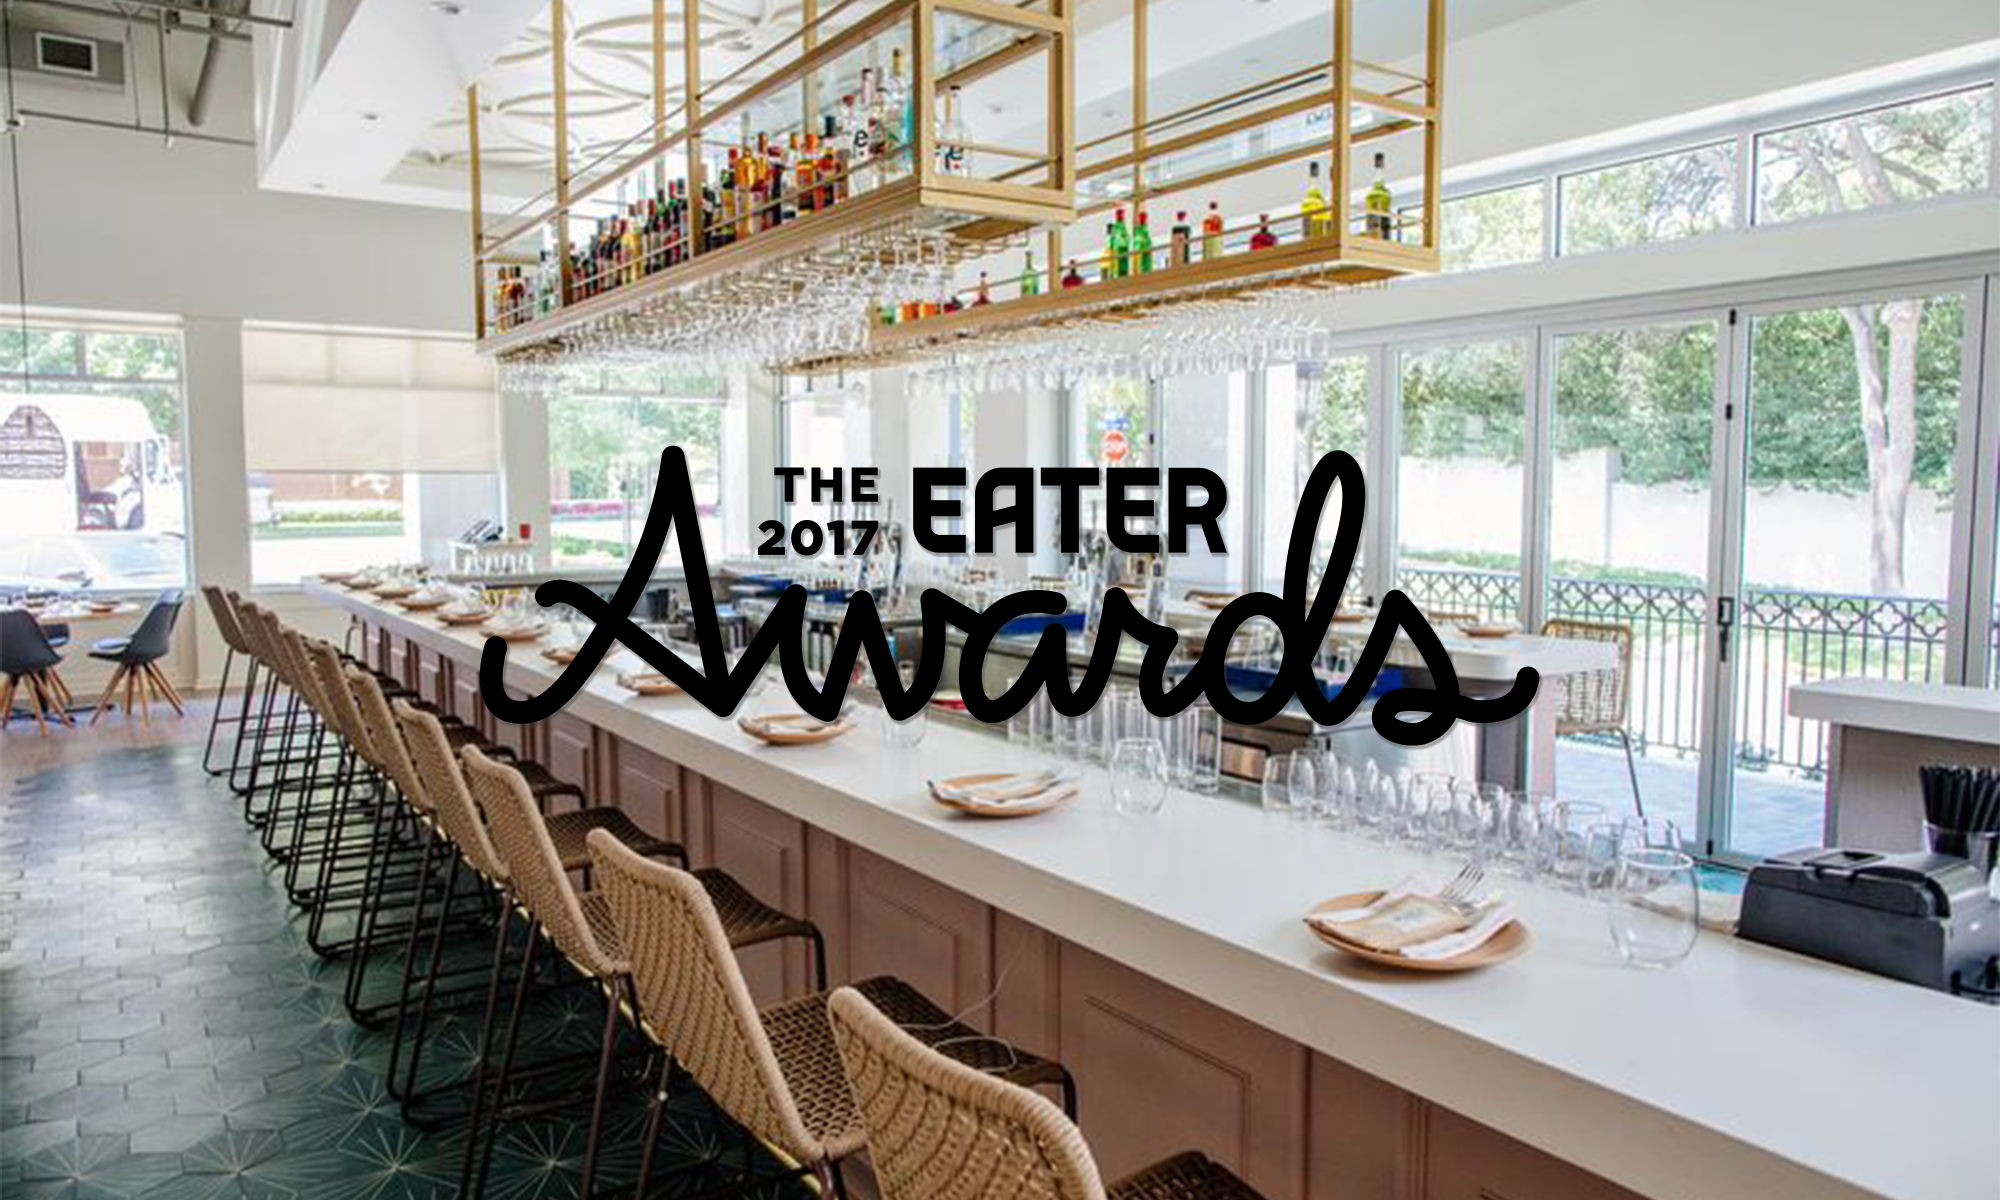 Dallas' 2017 Eater Awards Winners